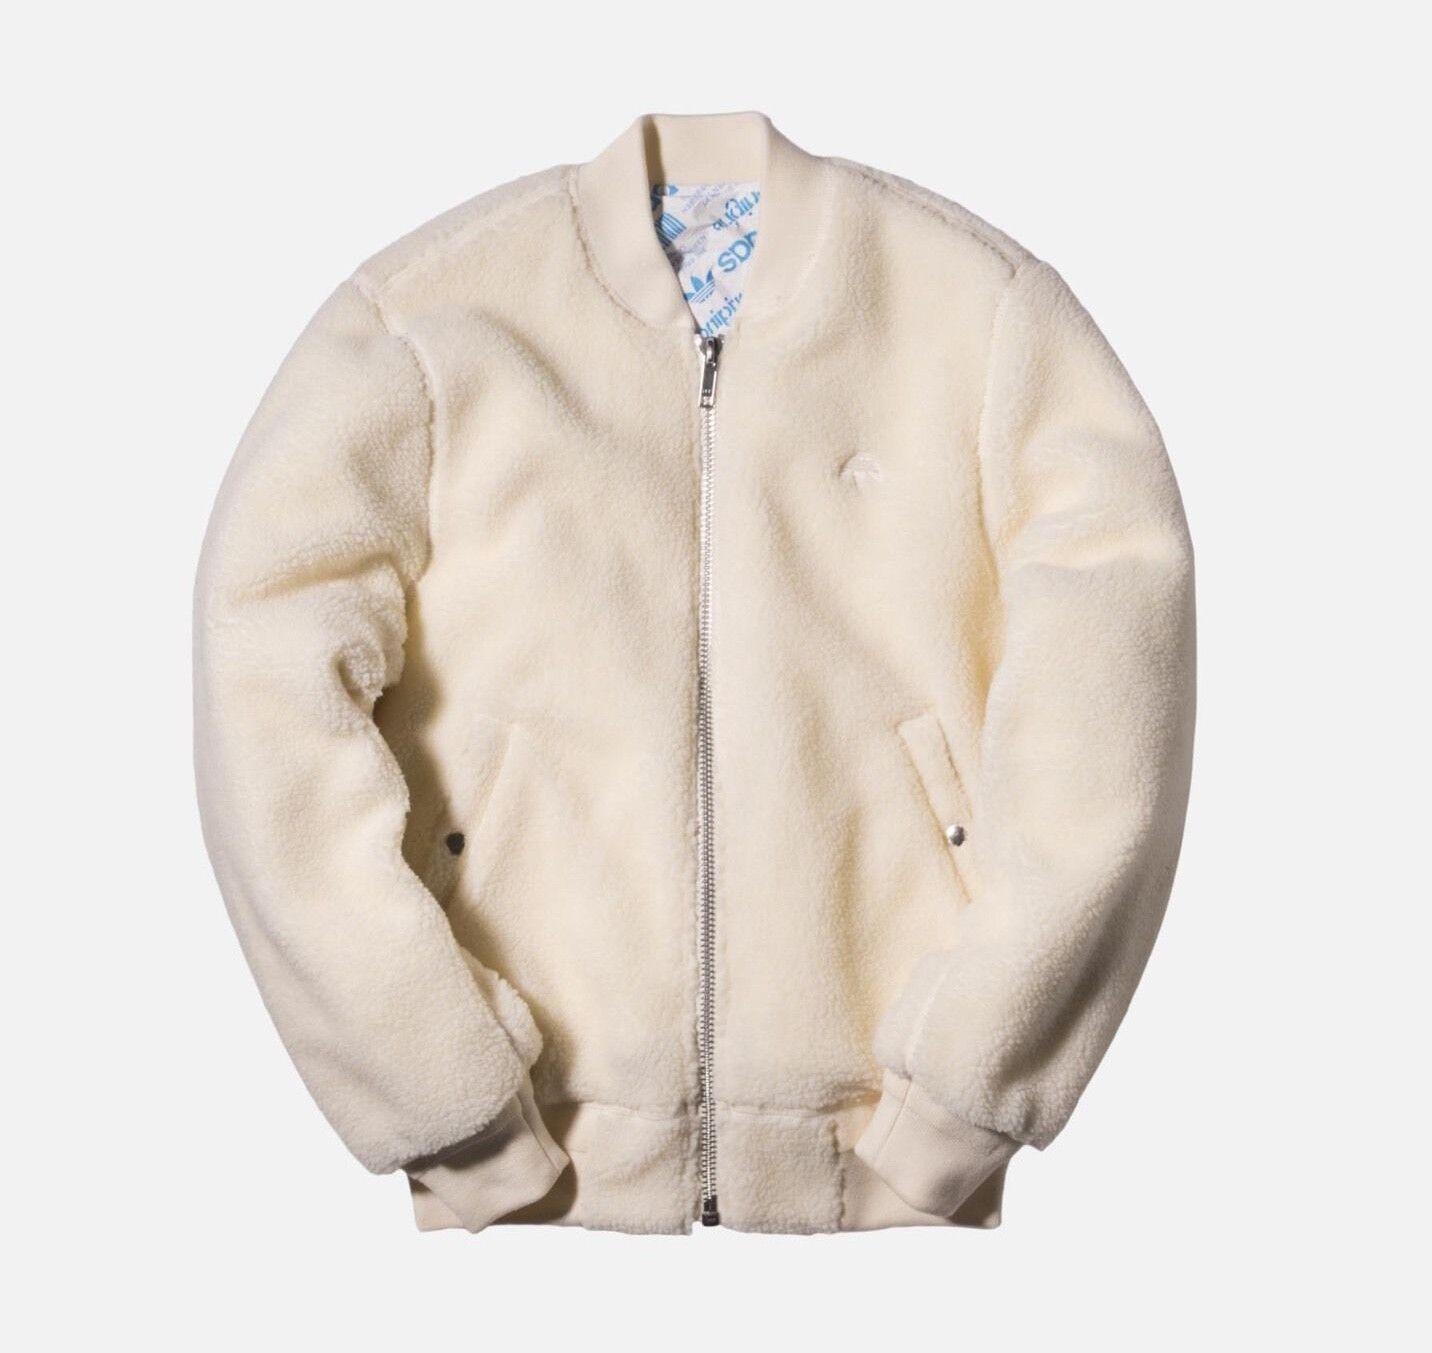 adidas Originals x Alexander Wang AW Reversible Fleece Boxy